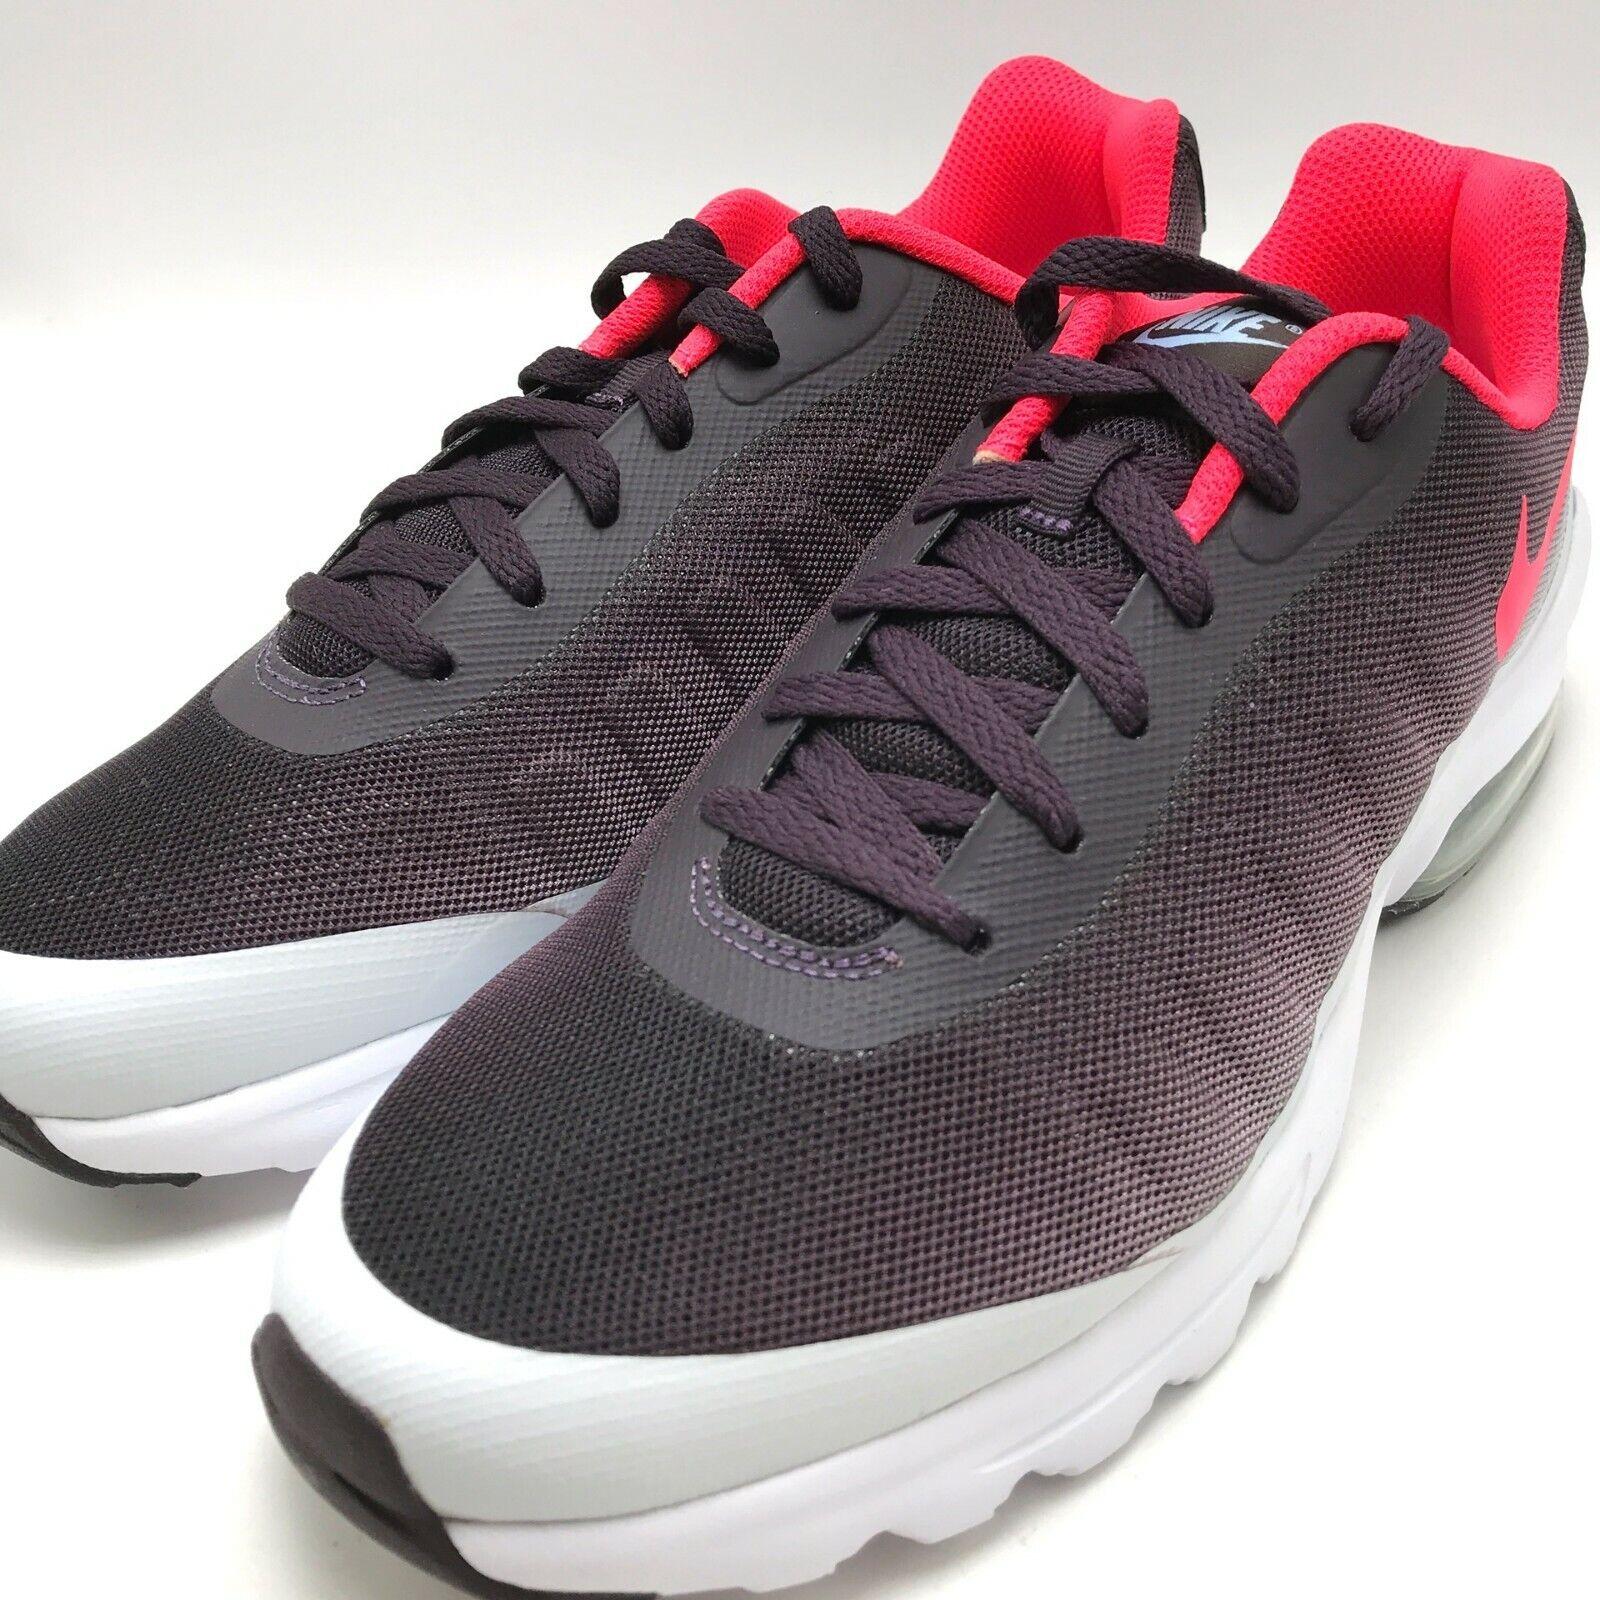 Nike Air Max Invigor Print Men's Running Port Wine   Solar Red 749688-601